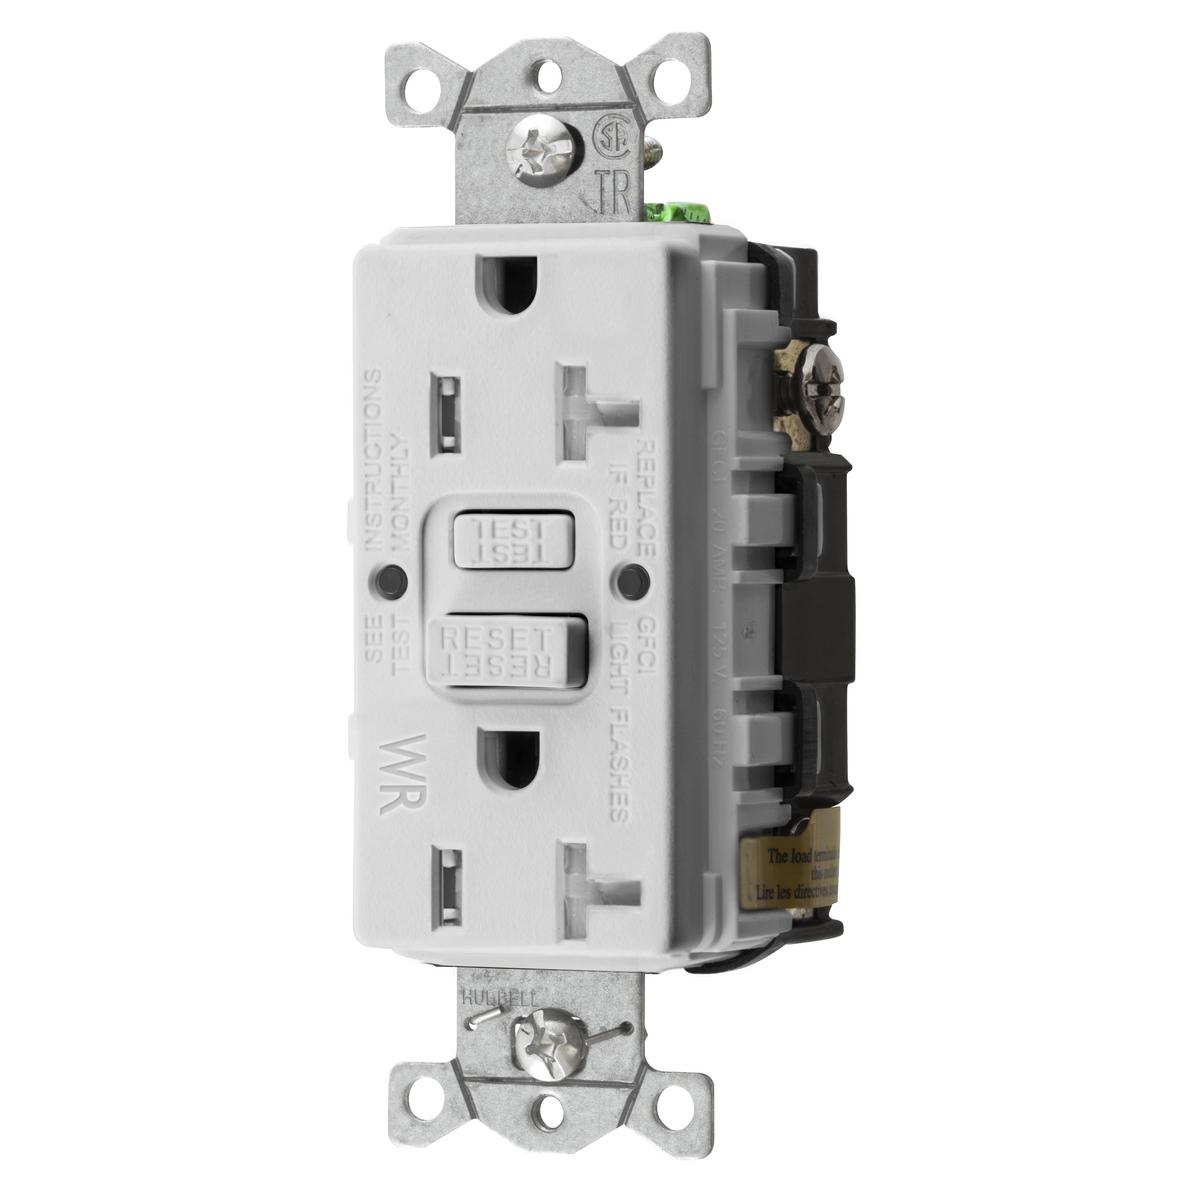 Hubbell GFTWRST20W 20 Amp 125 Volt 2-Pole 3-Wire NEMA 5-20R White GFCI Receptacle